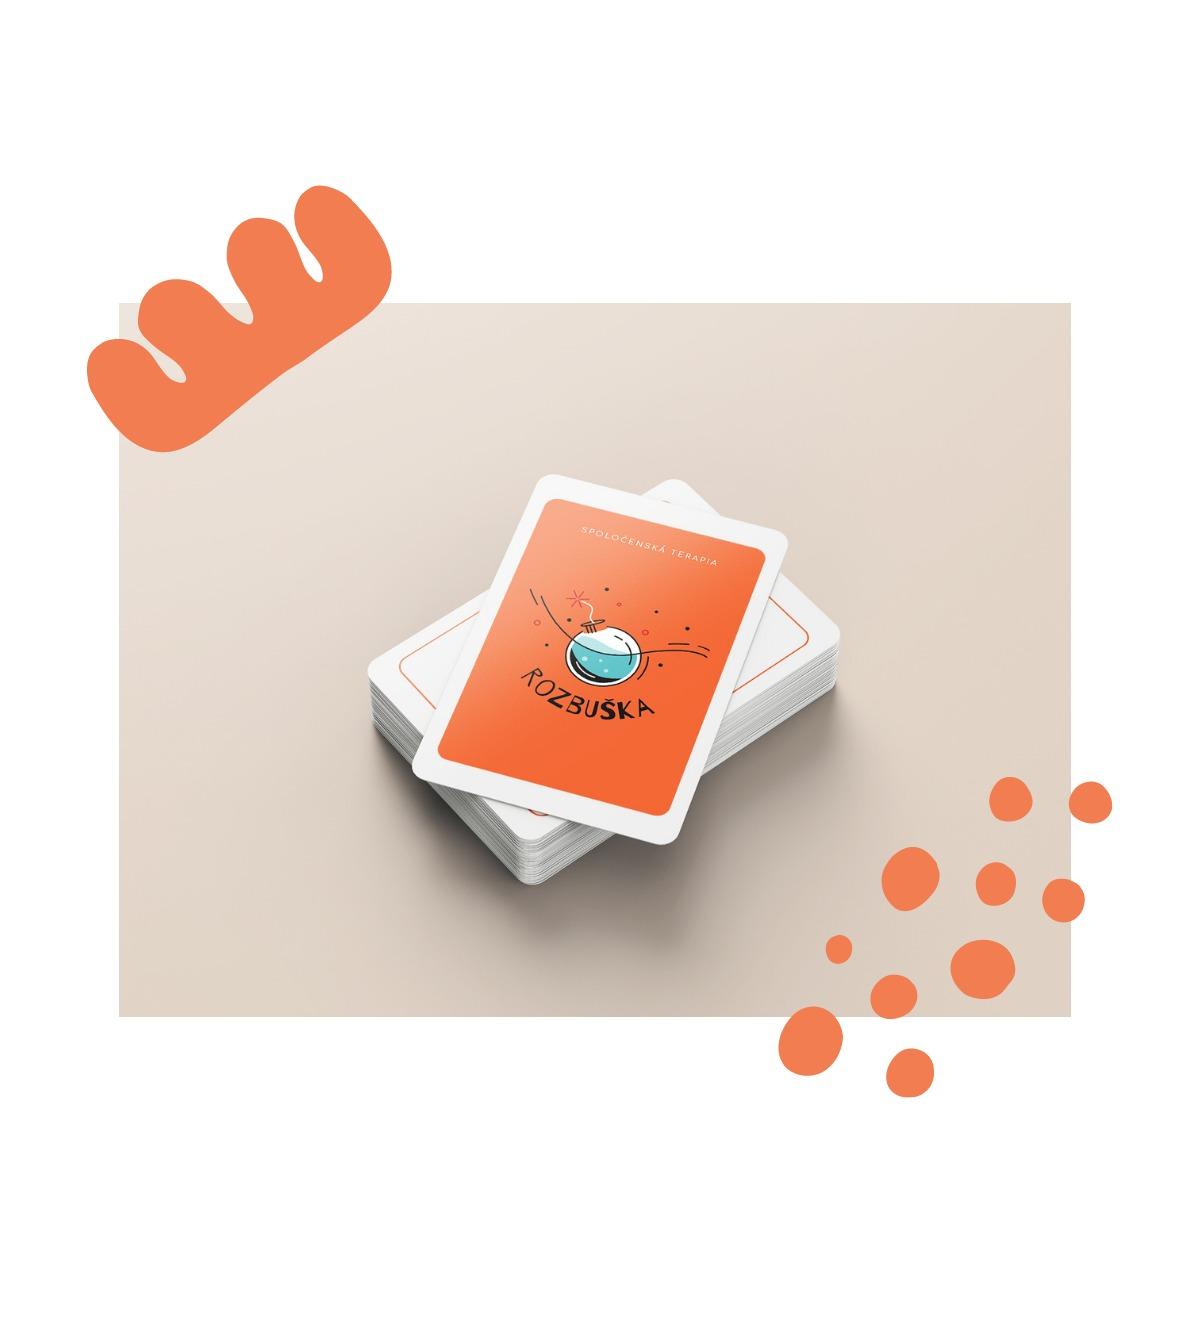 spolocenskaterapia.sk-spolocenska-terapia-spolocenska-hra-zabava-kartova-hra-spolocenska-hra-karty-karticky-hracie-karty-kategoria-rozbuska